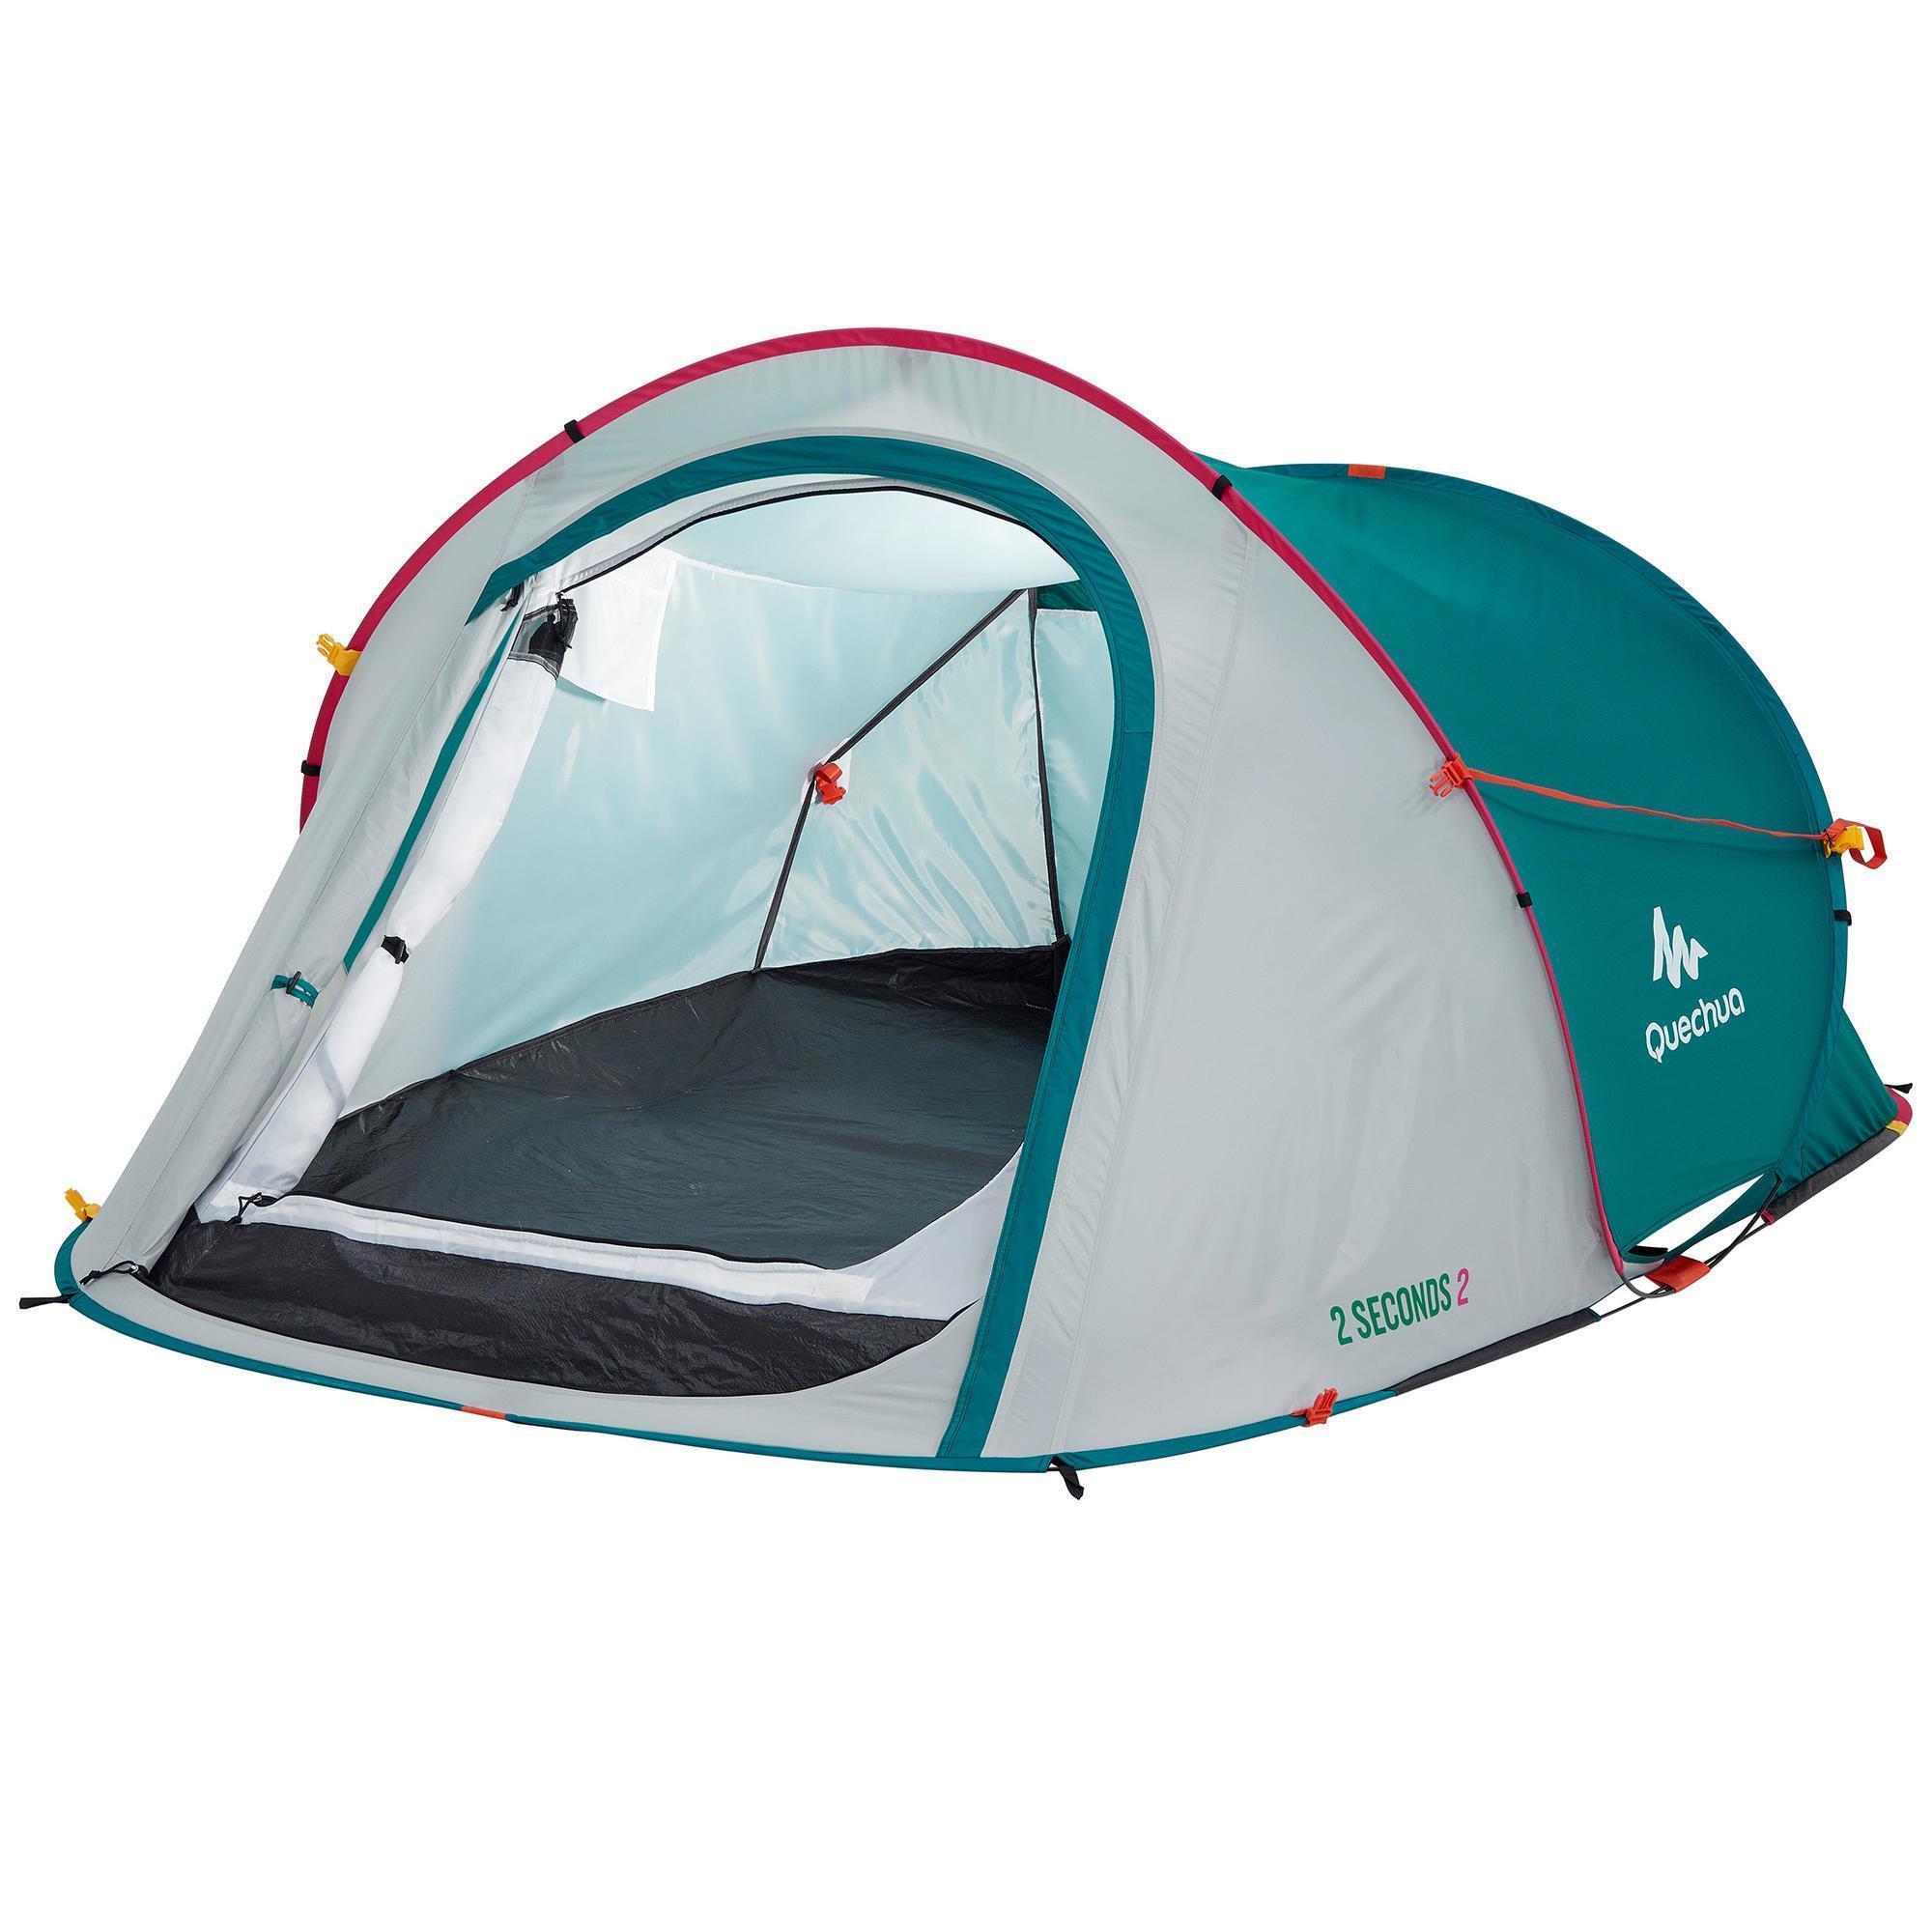 2 seconds camping tent 2 person green pink quechua. Black Bedroom Furniture Sets. Home Design Ideas